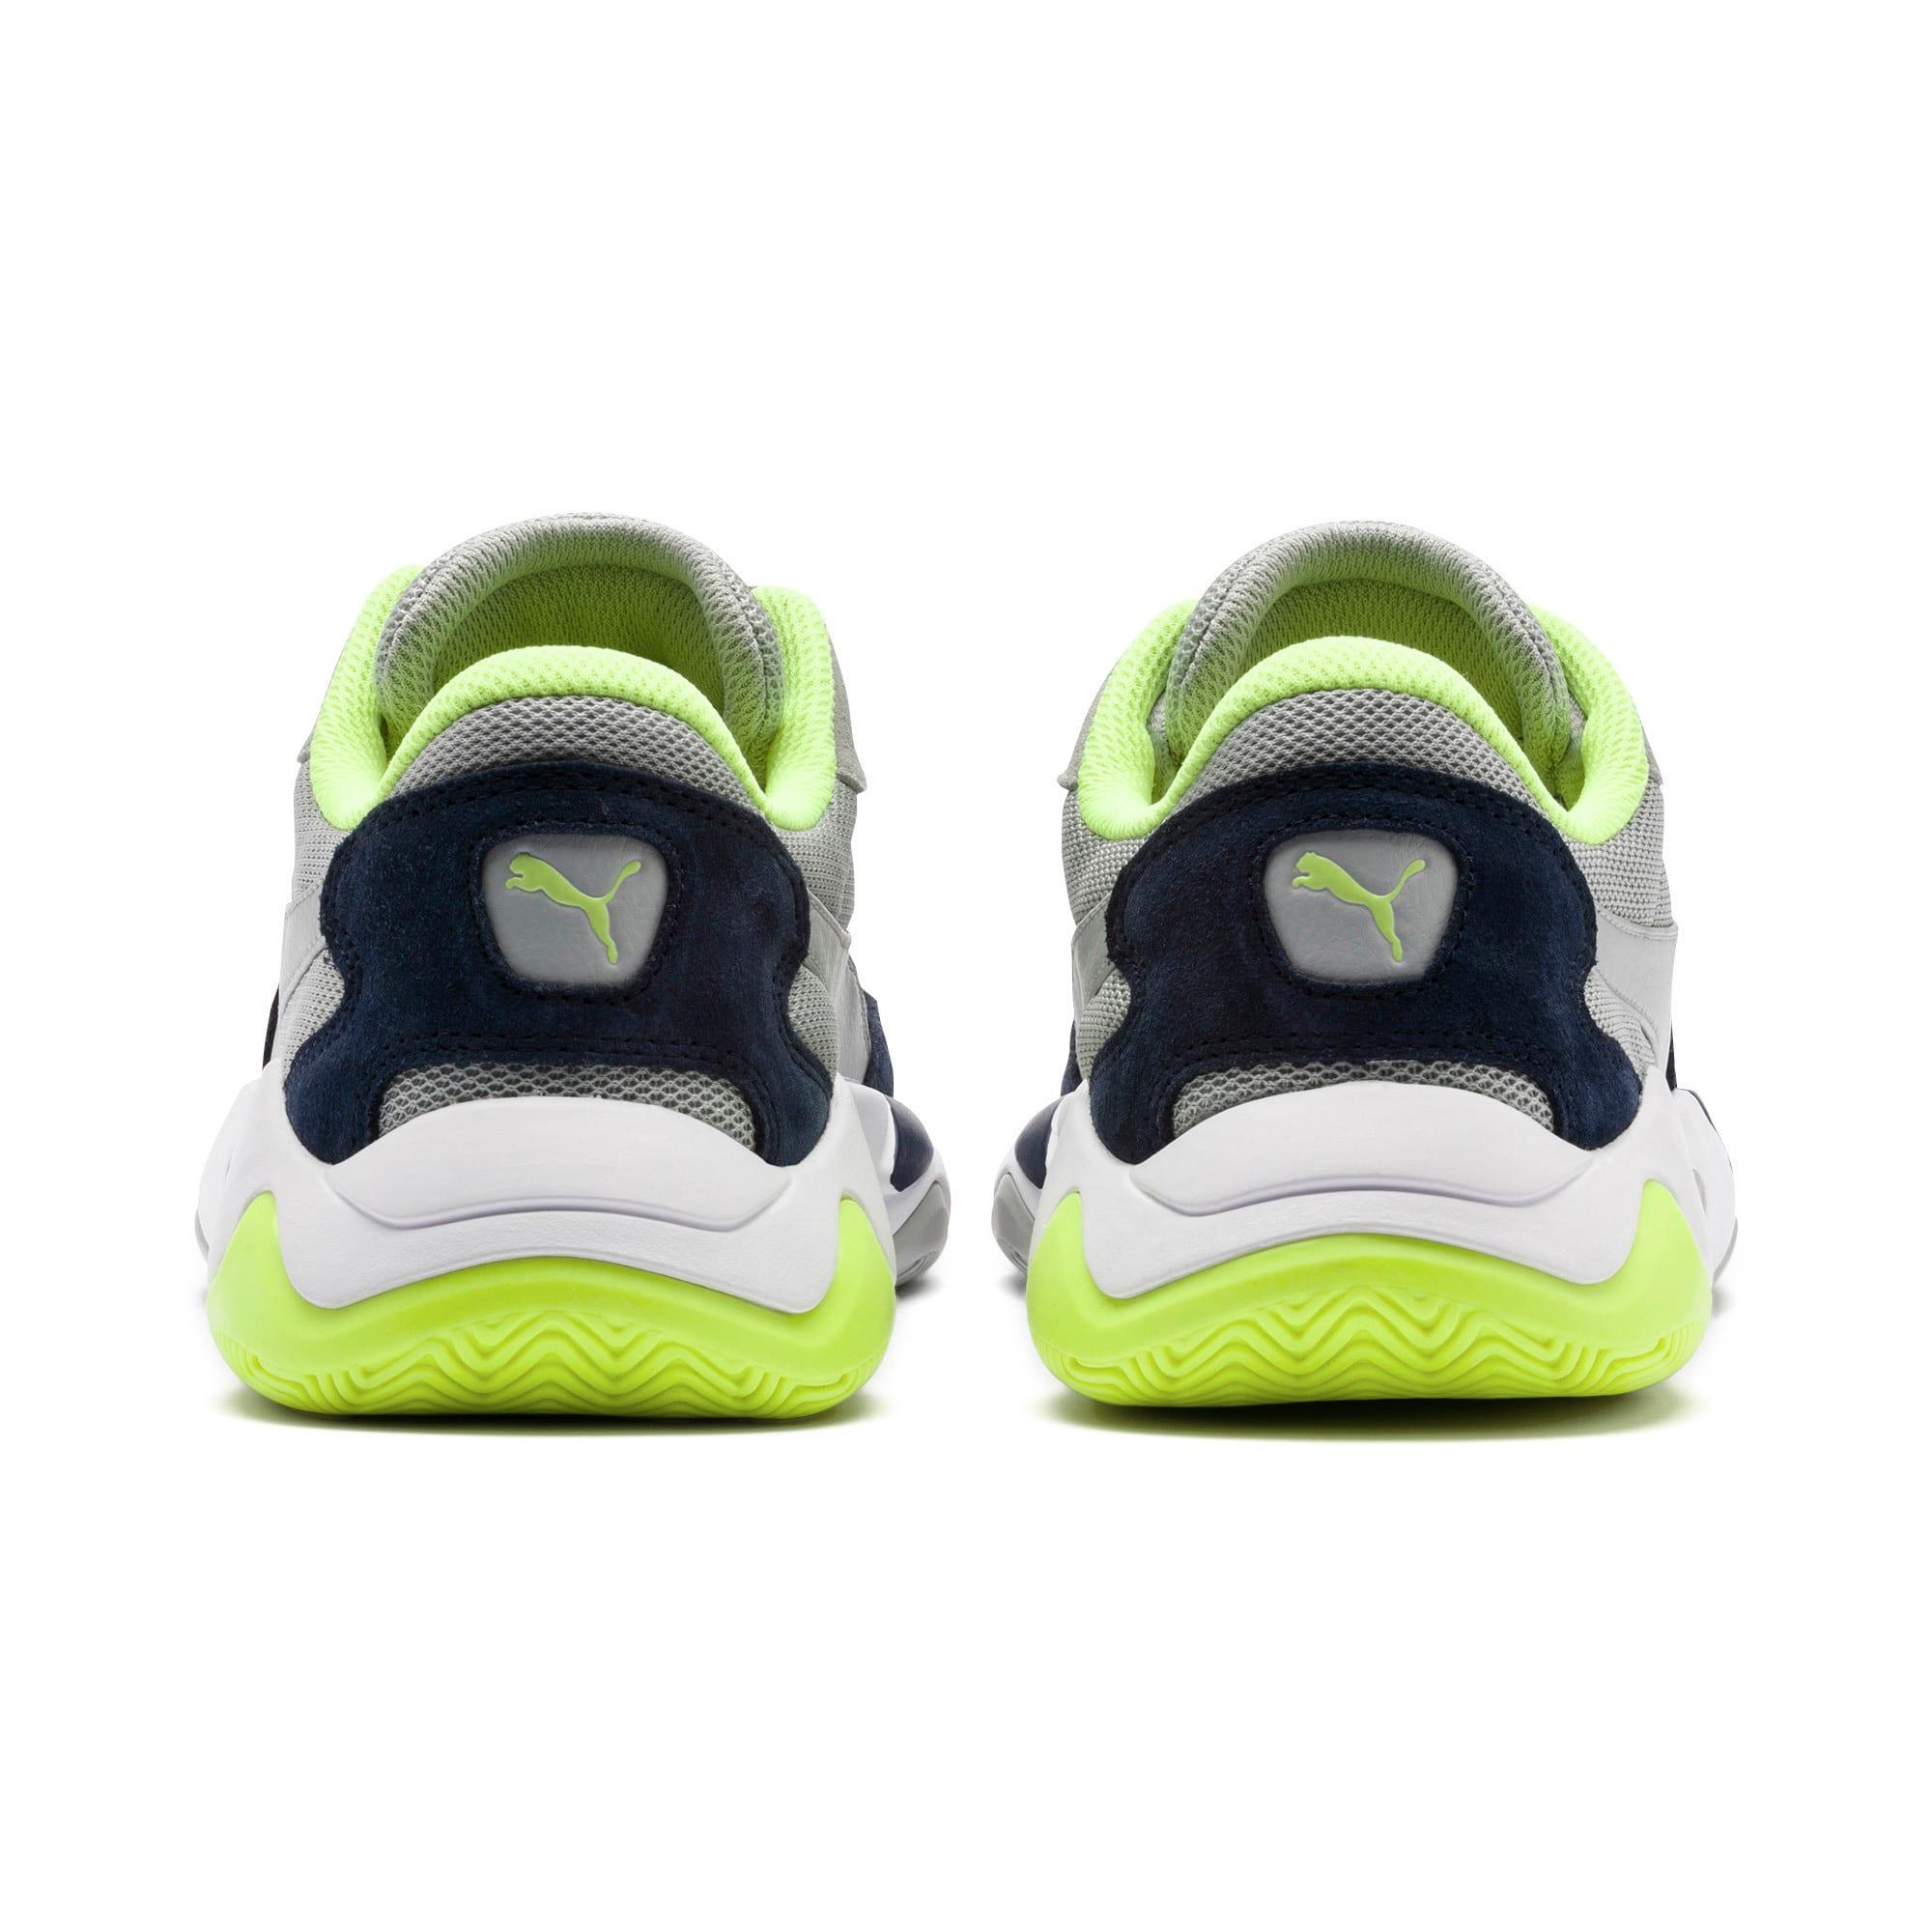 Thumbnail 5 of Storm Adrenaline Sneakers, Peacoat-High Rise, medium